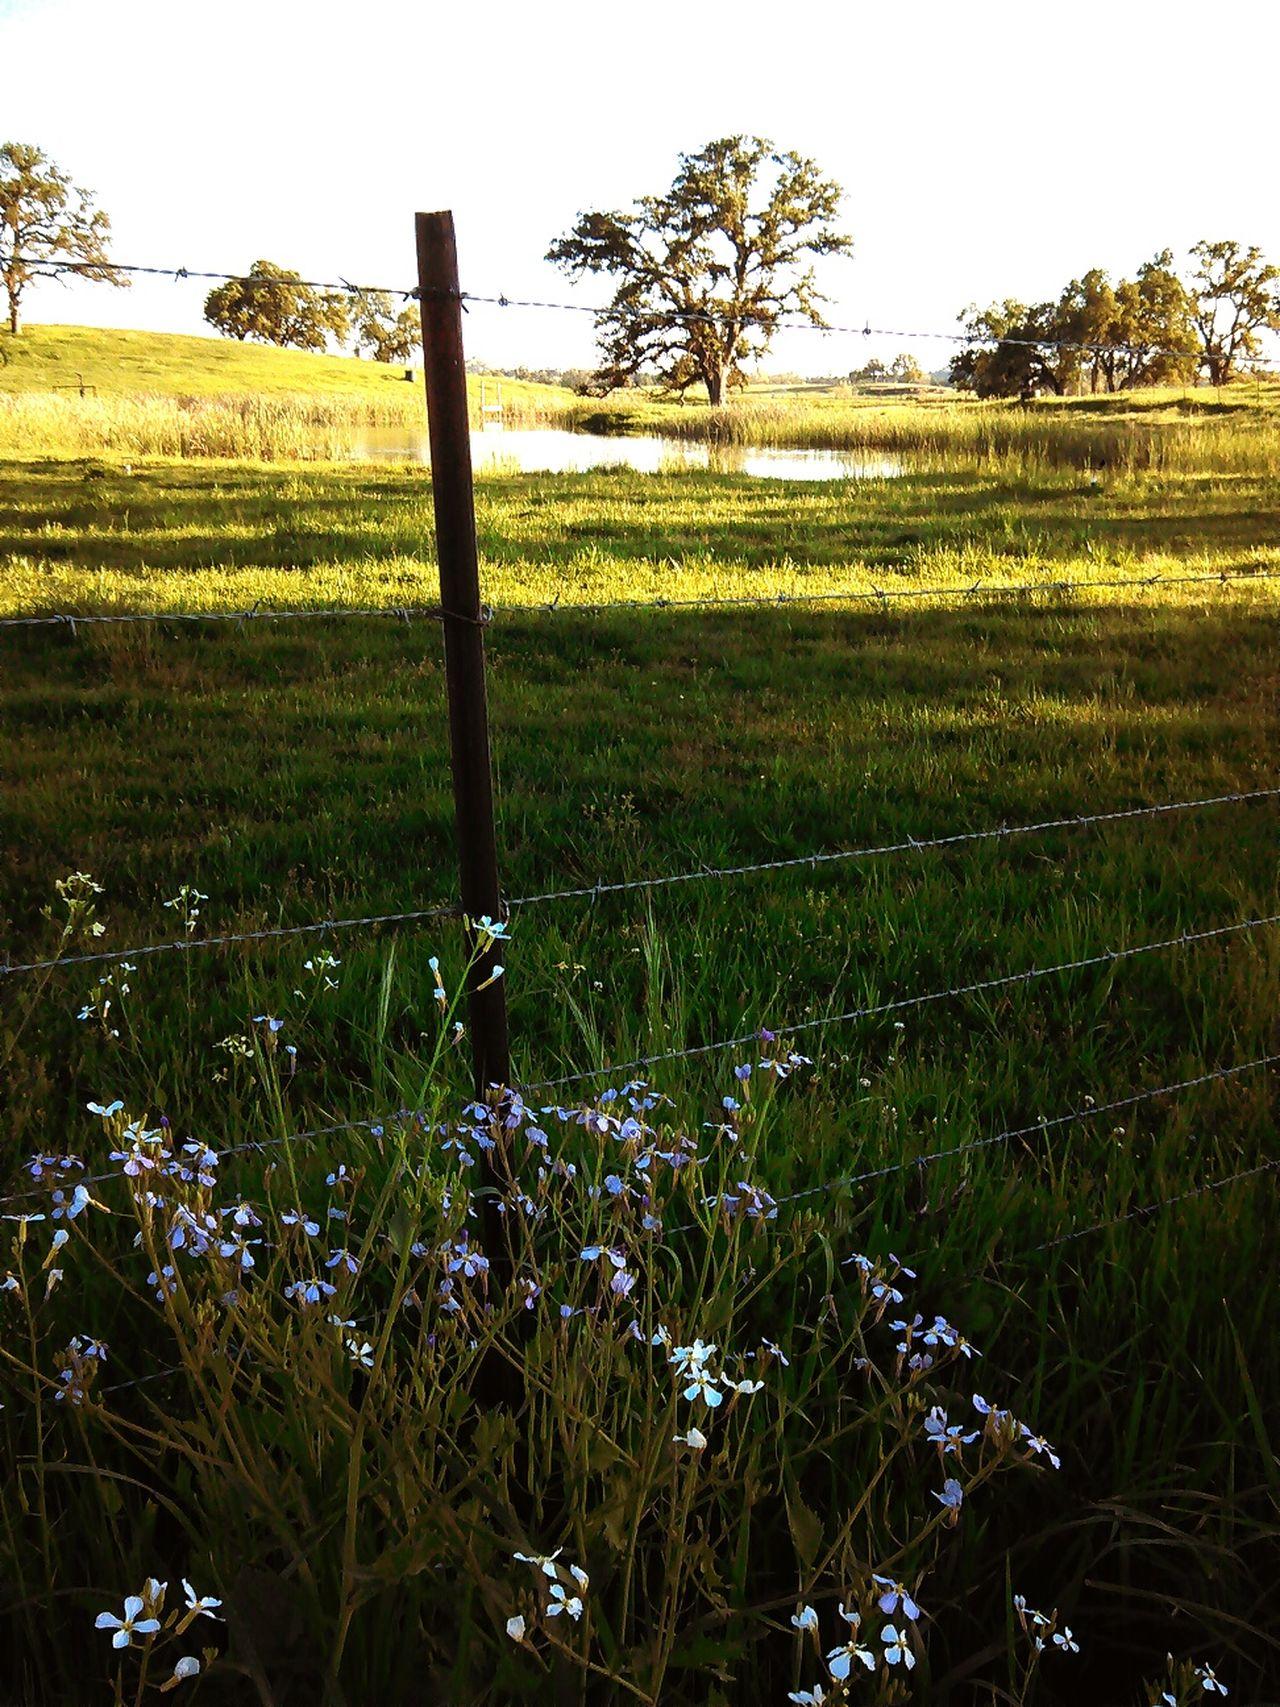 Loudthougts EyeEm Nature Lover Deadend Miles Mighty Oaks SpringFever Its Been10feet Thankful